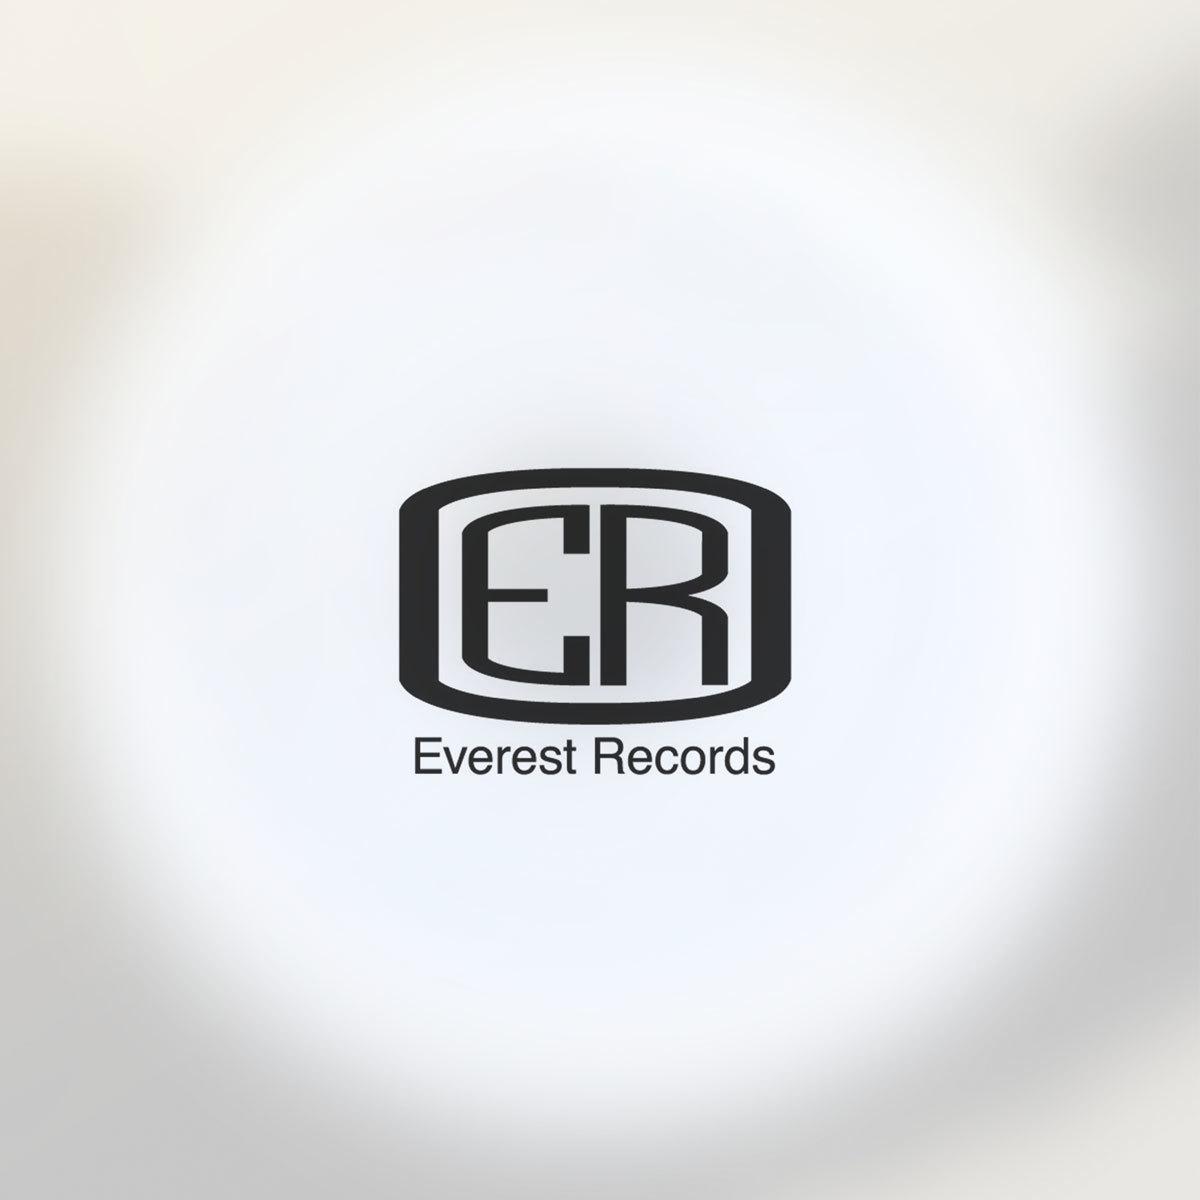 Everest Records 00 MHG Bern